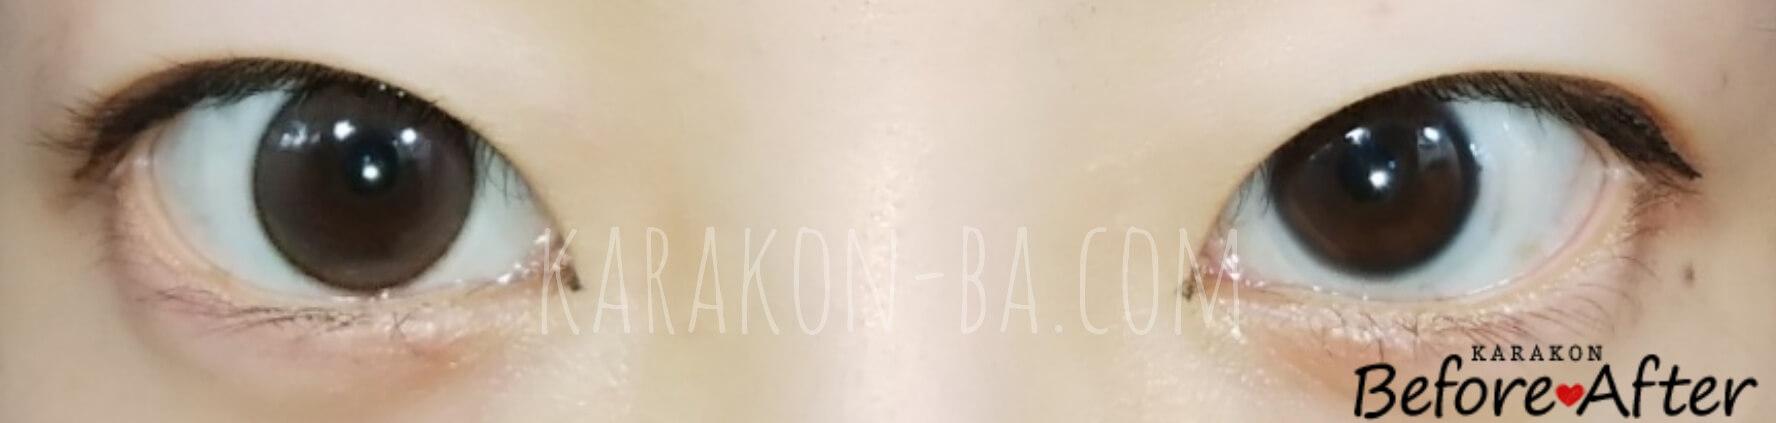 【NEW】パールベージュのカラコン装着画像/裸眼と比較